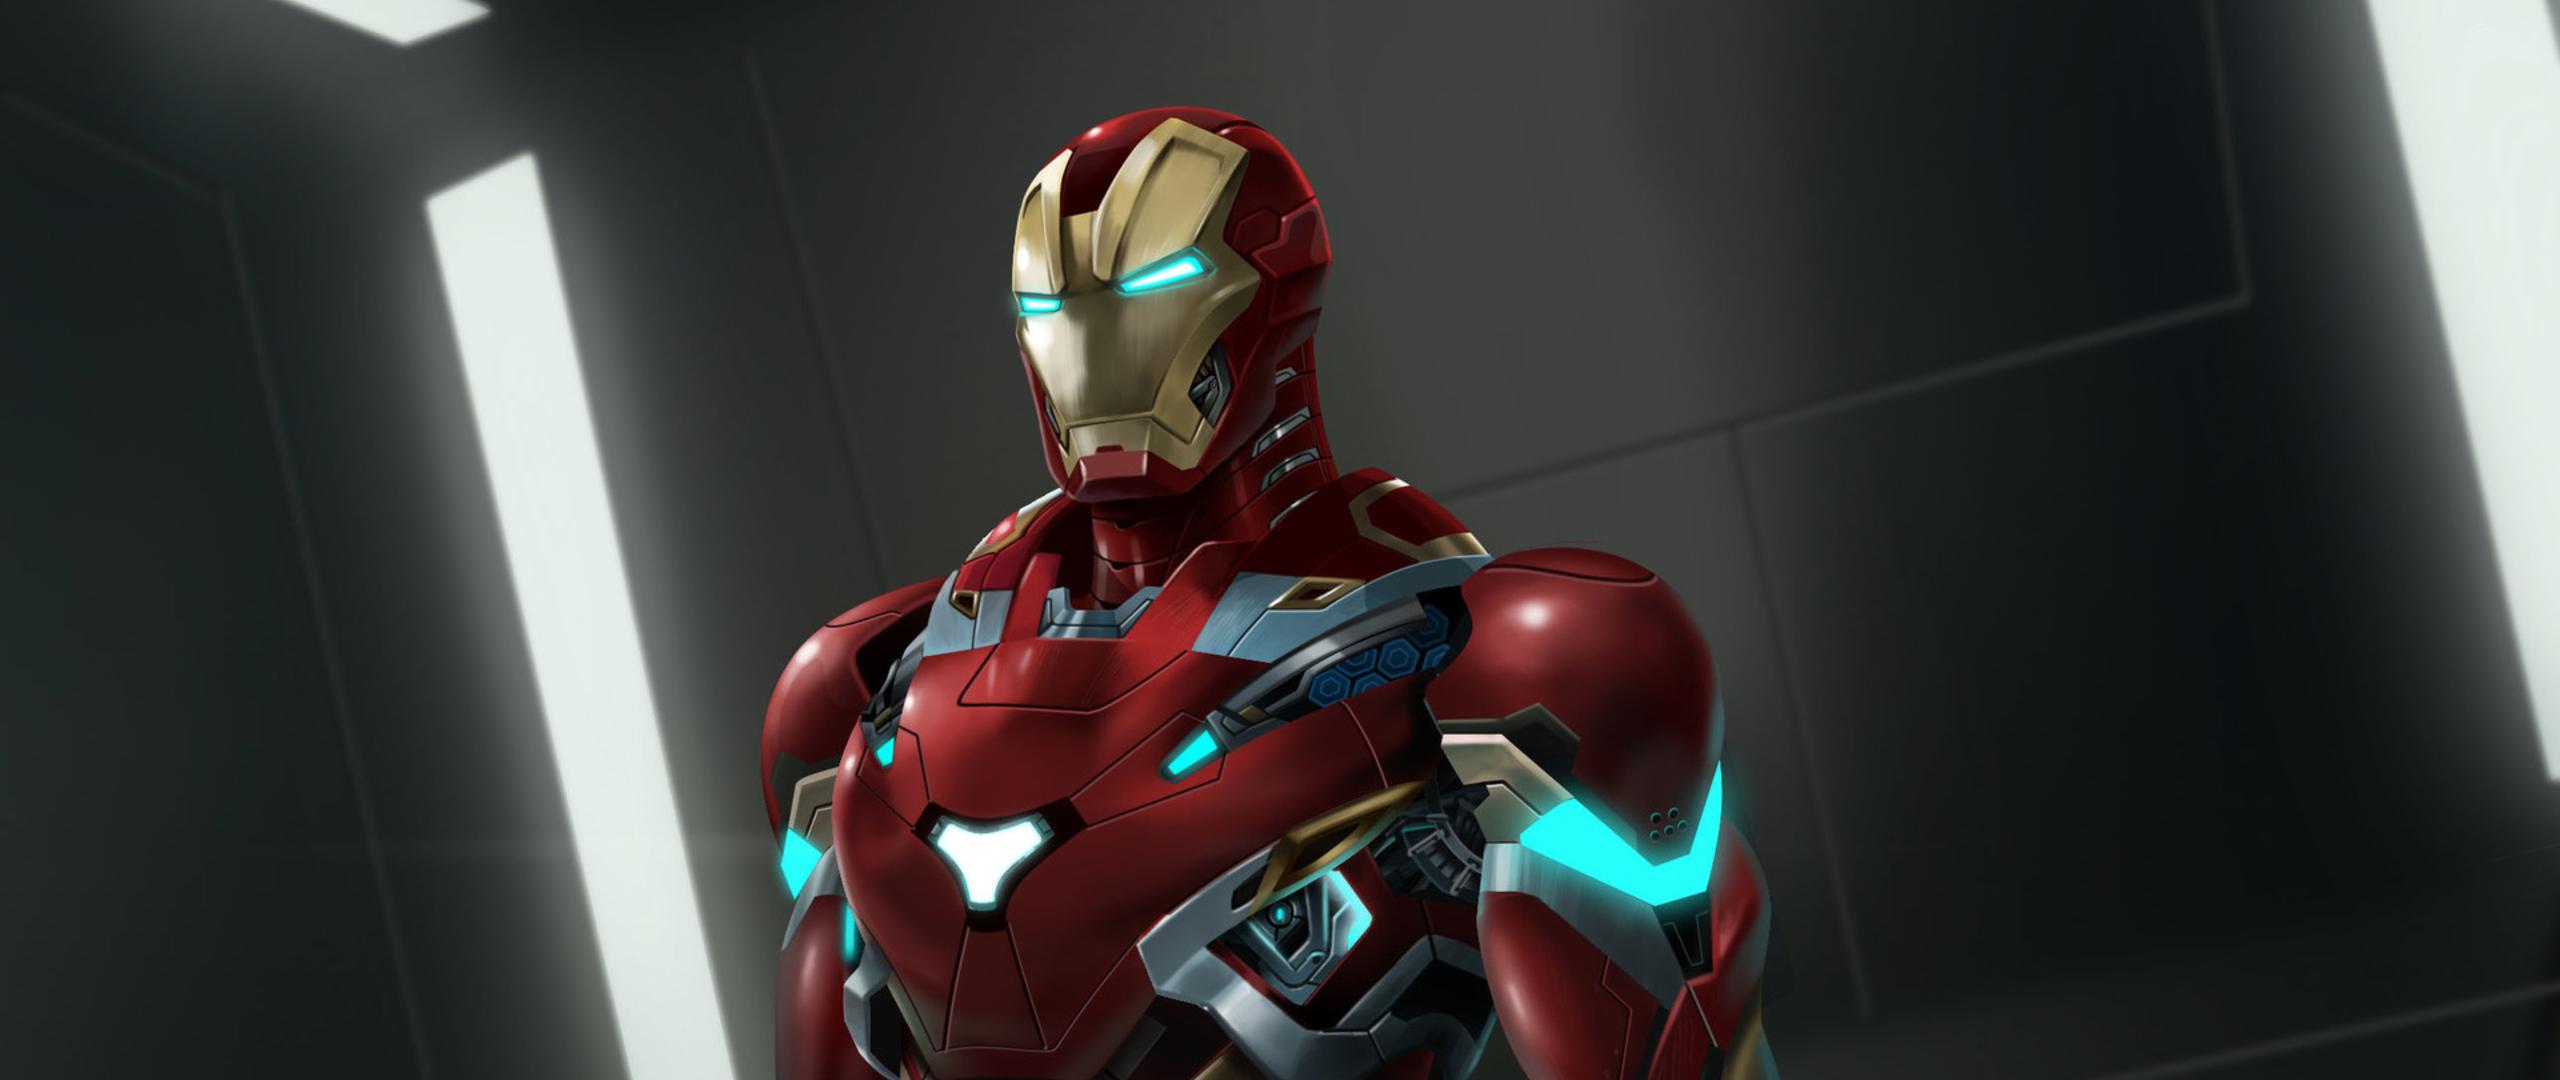 iron-man-suit-artwork-pt.jpg